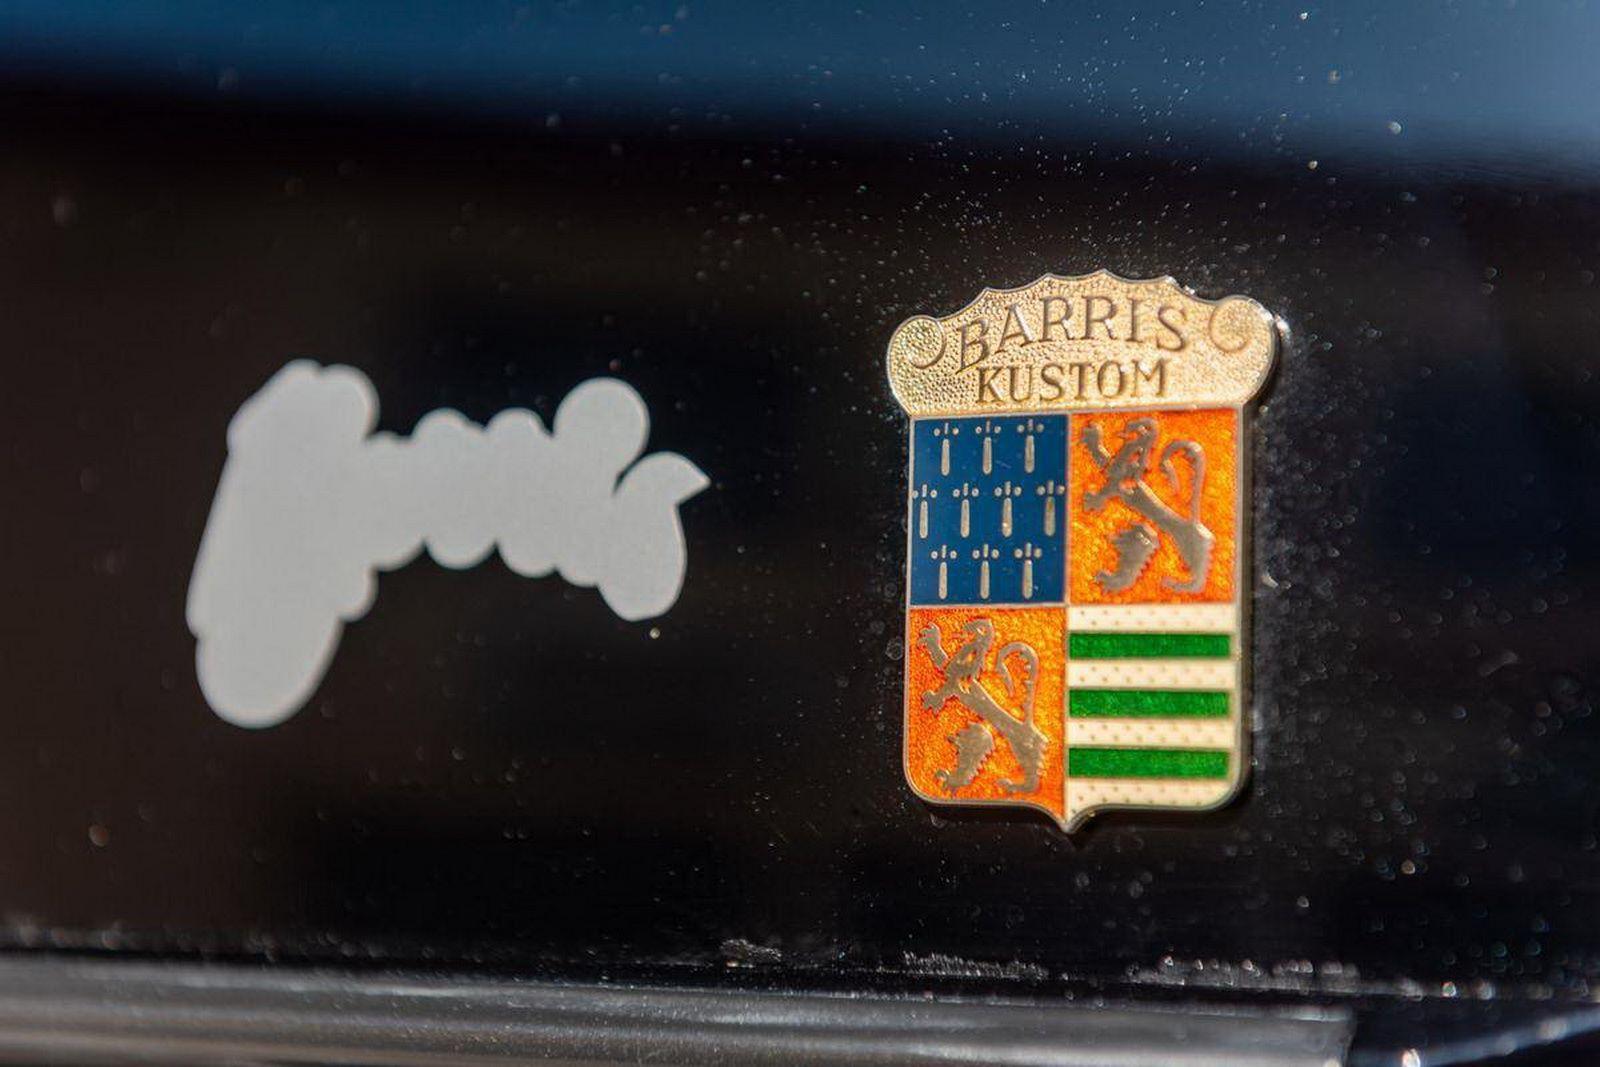 1982-pontiac-firebird-kitt-replica-george-barris-24